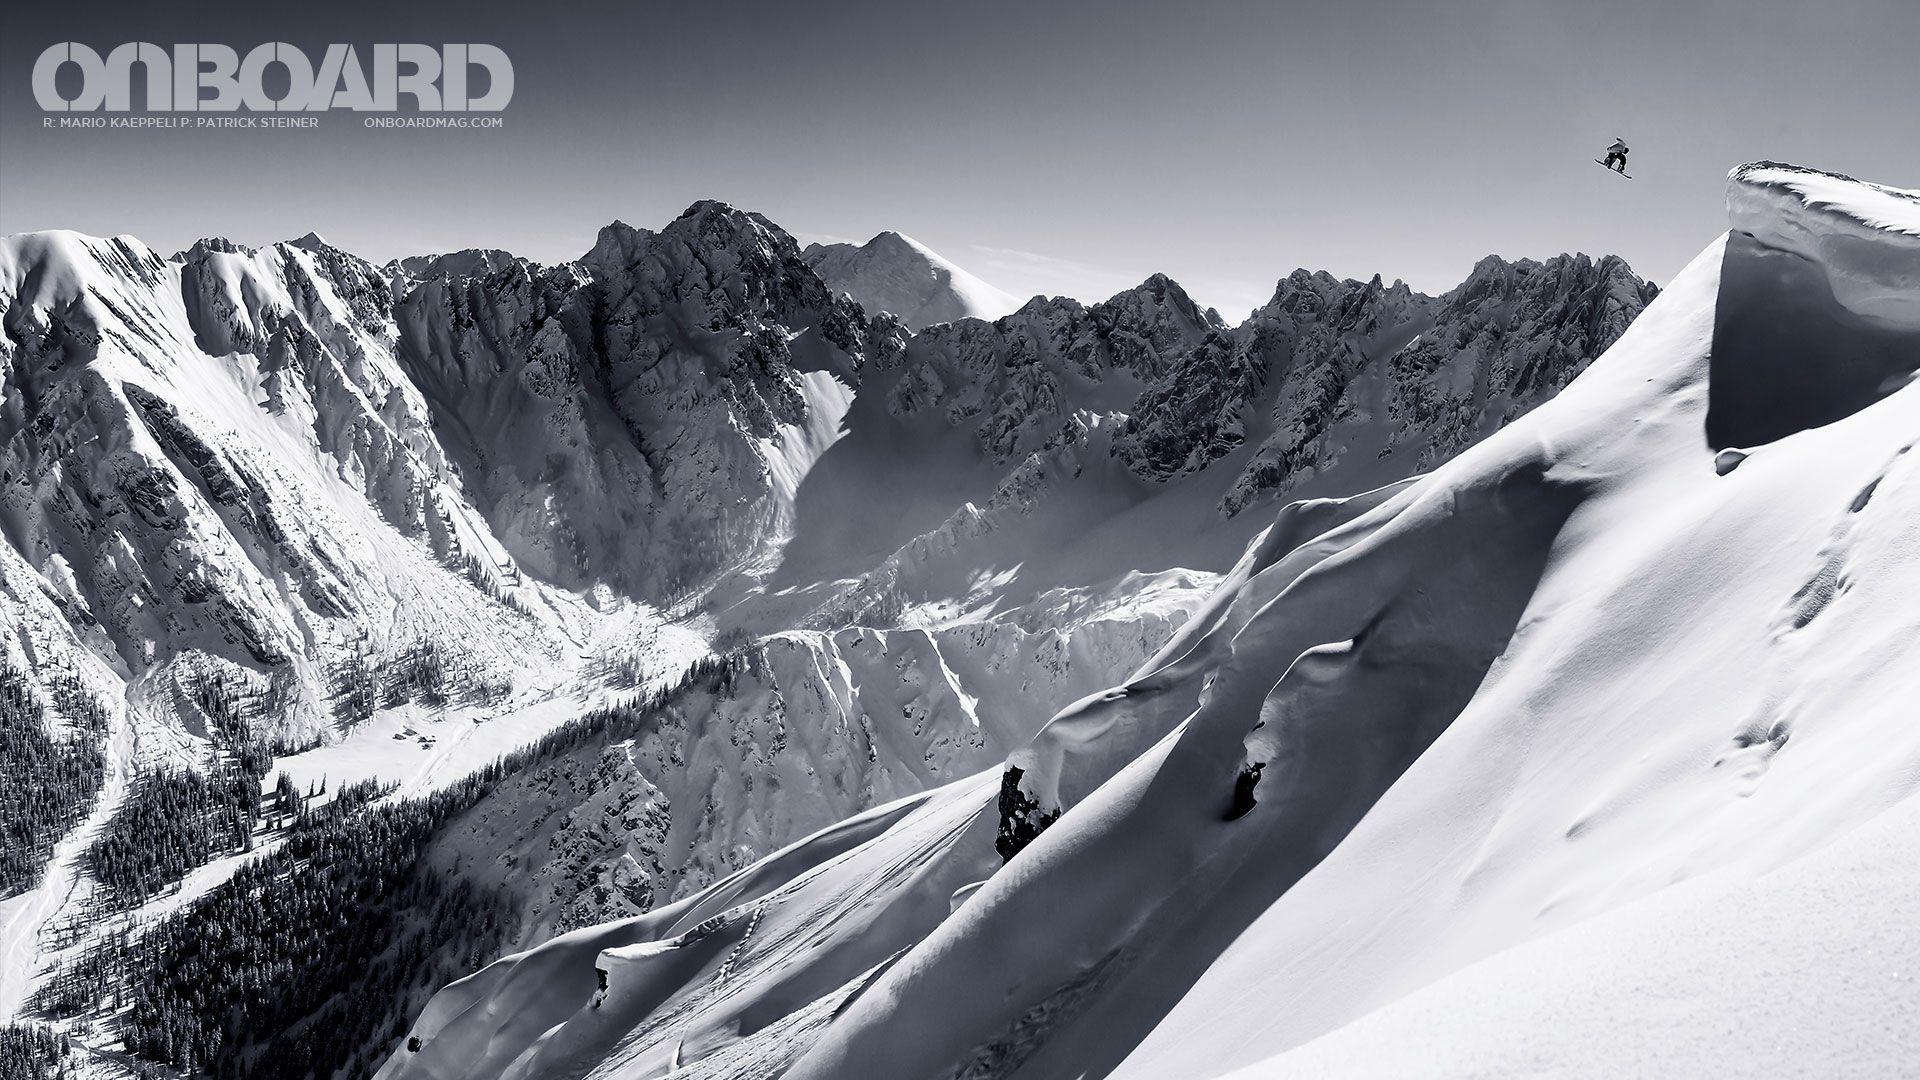 Wallpaper Mario Kaeppeli Backside 180 Tyrol Onboard Magazine Snowboarding Wallpaper Snowboarding Transworld Snowboarding